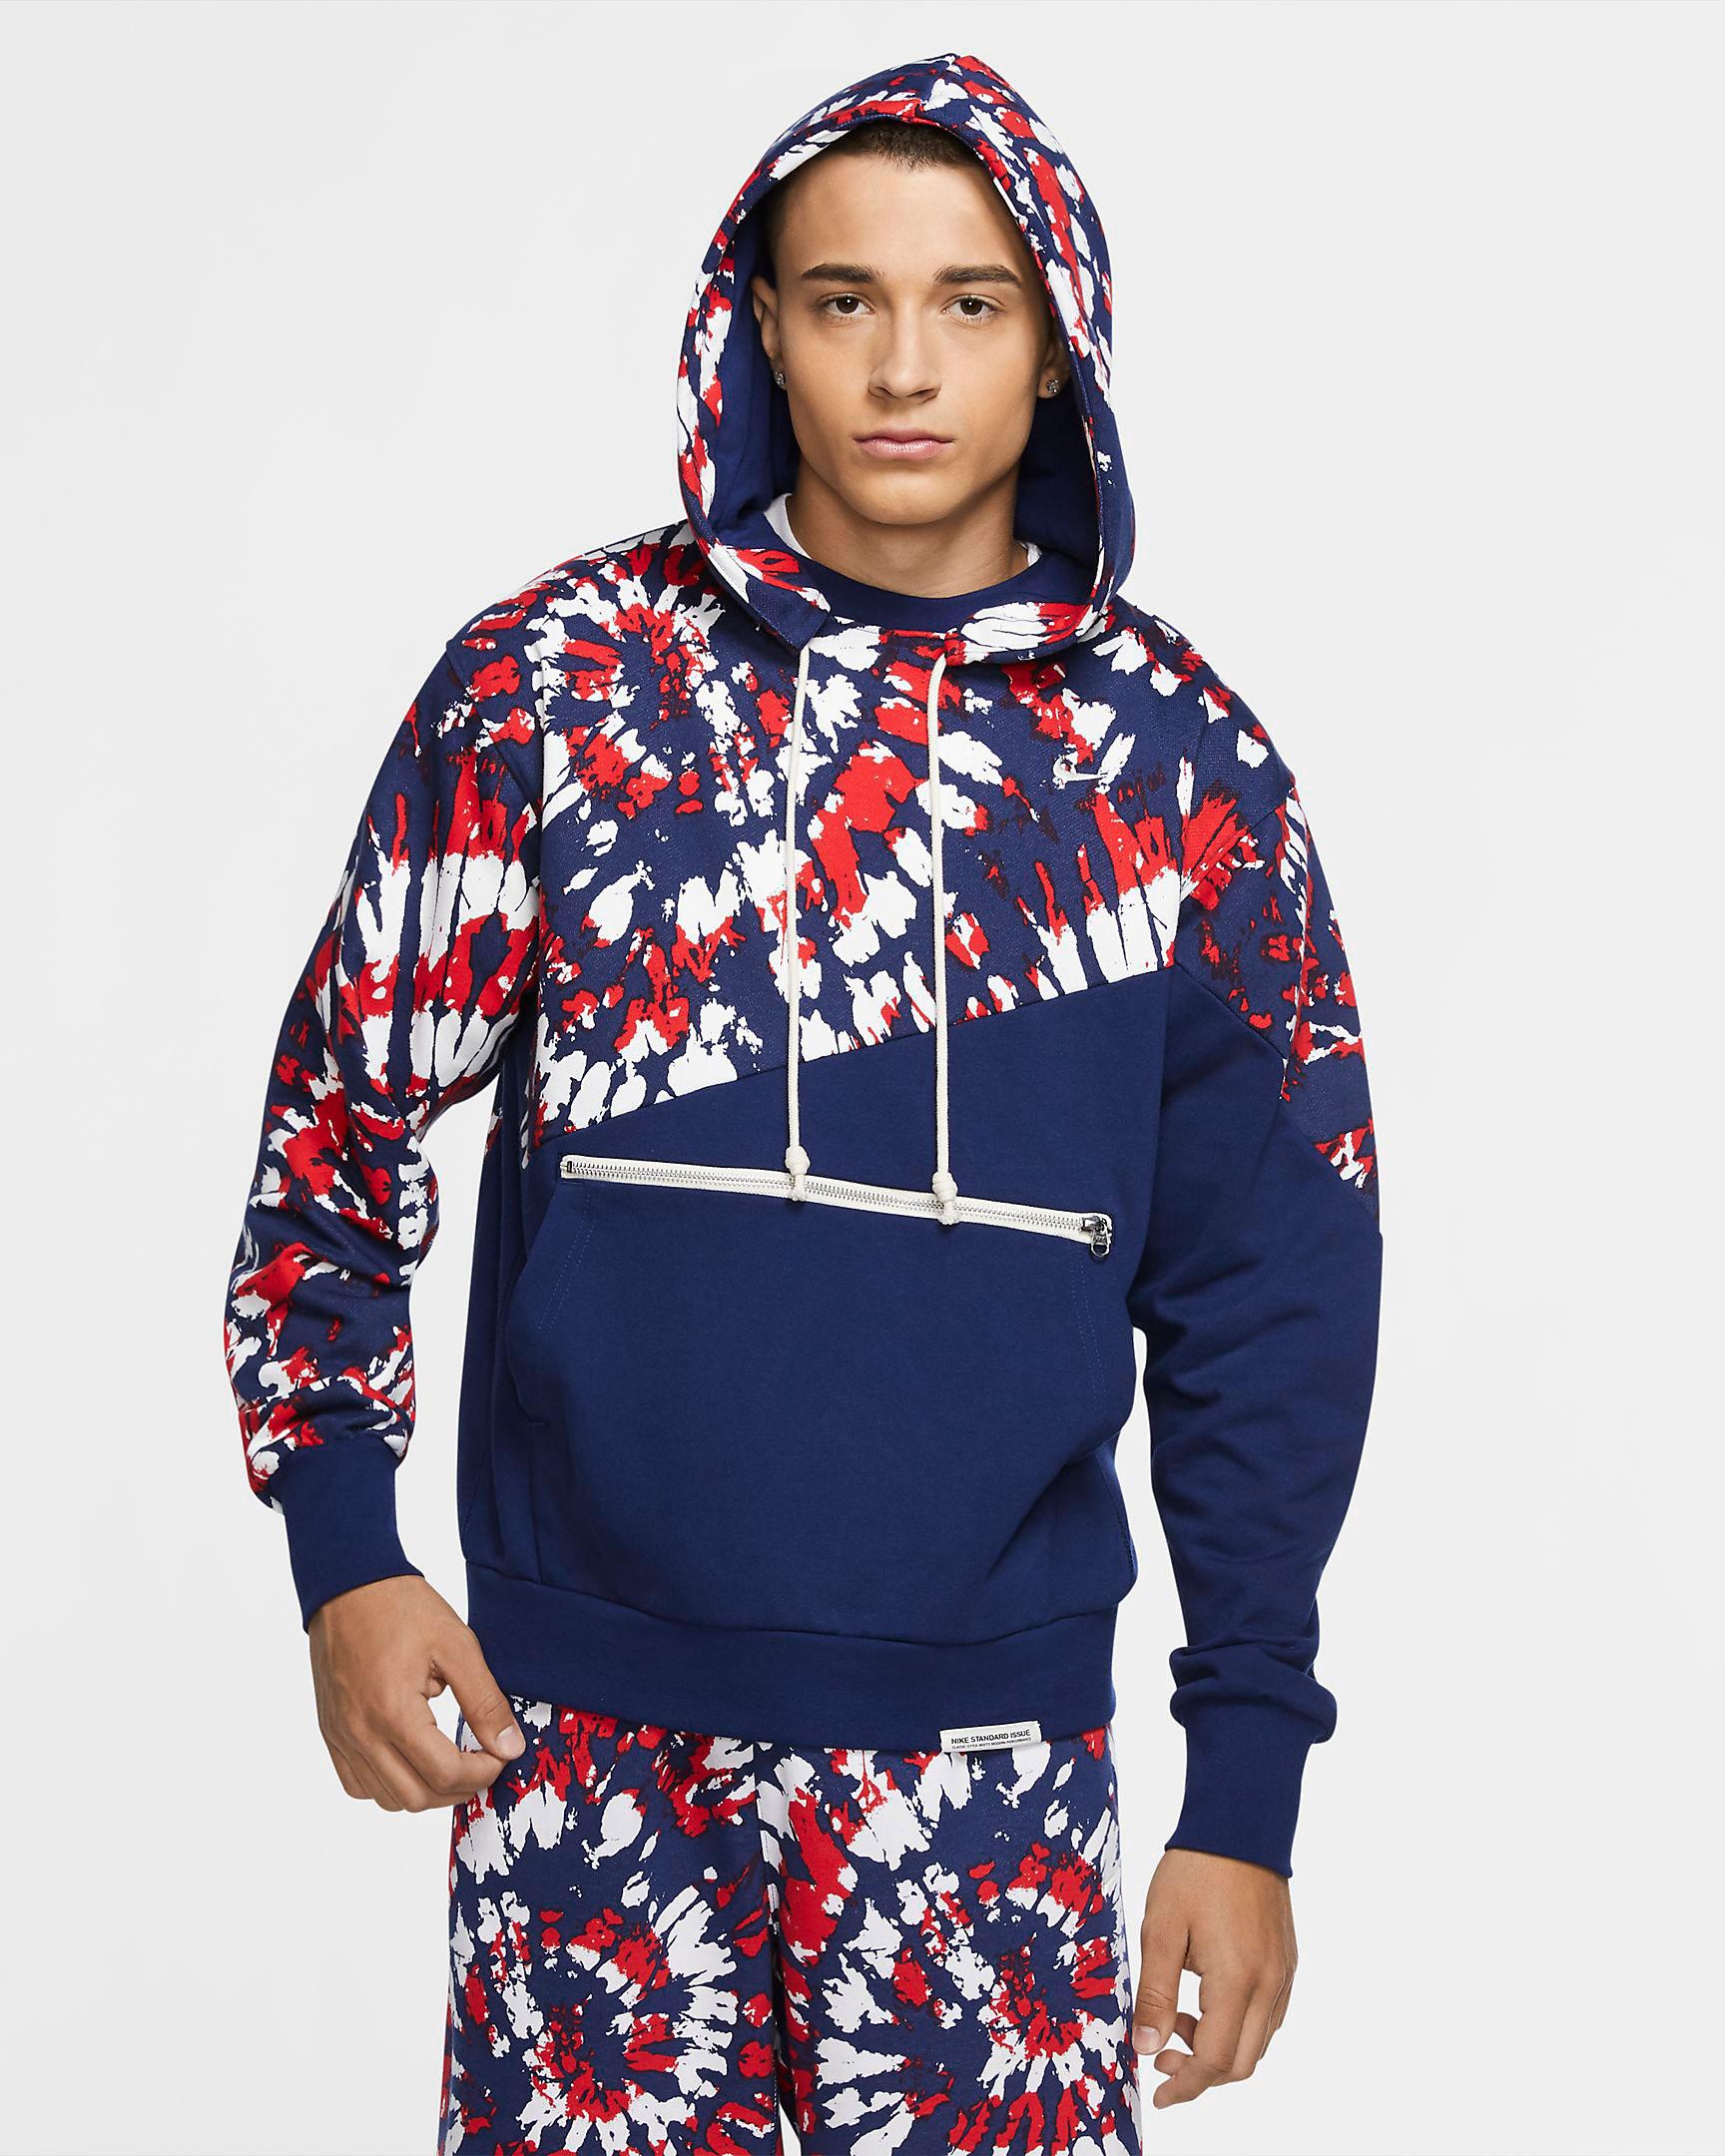 nike-lebron-17-graffiti-fire-red-cold-blue-hoodie-match